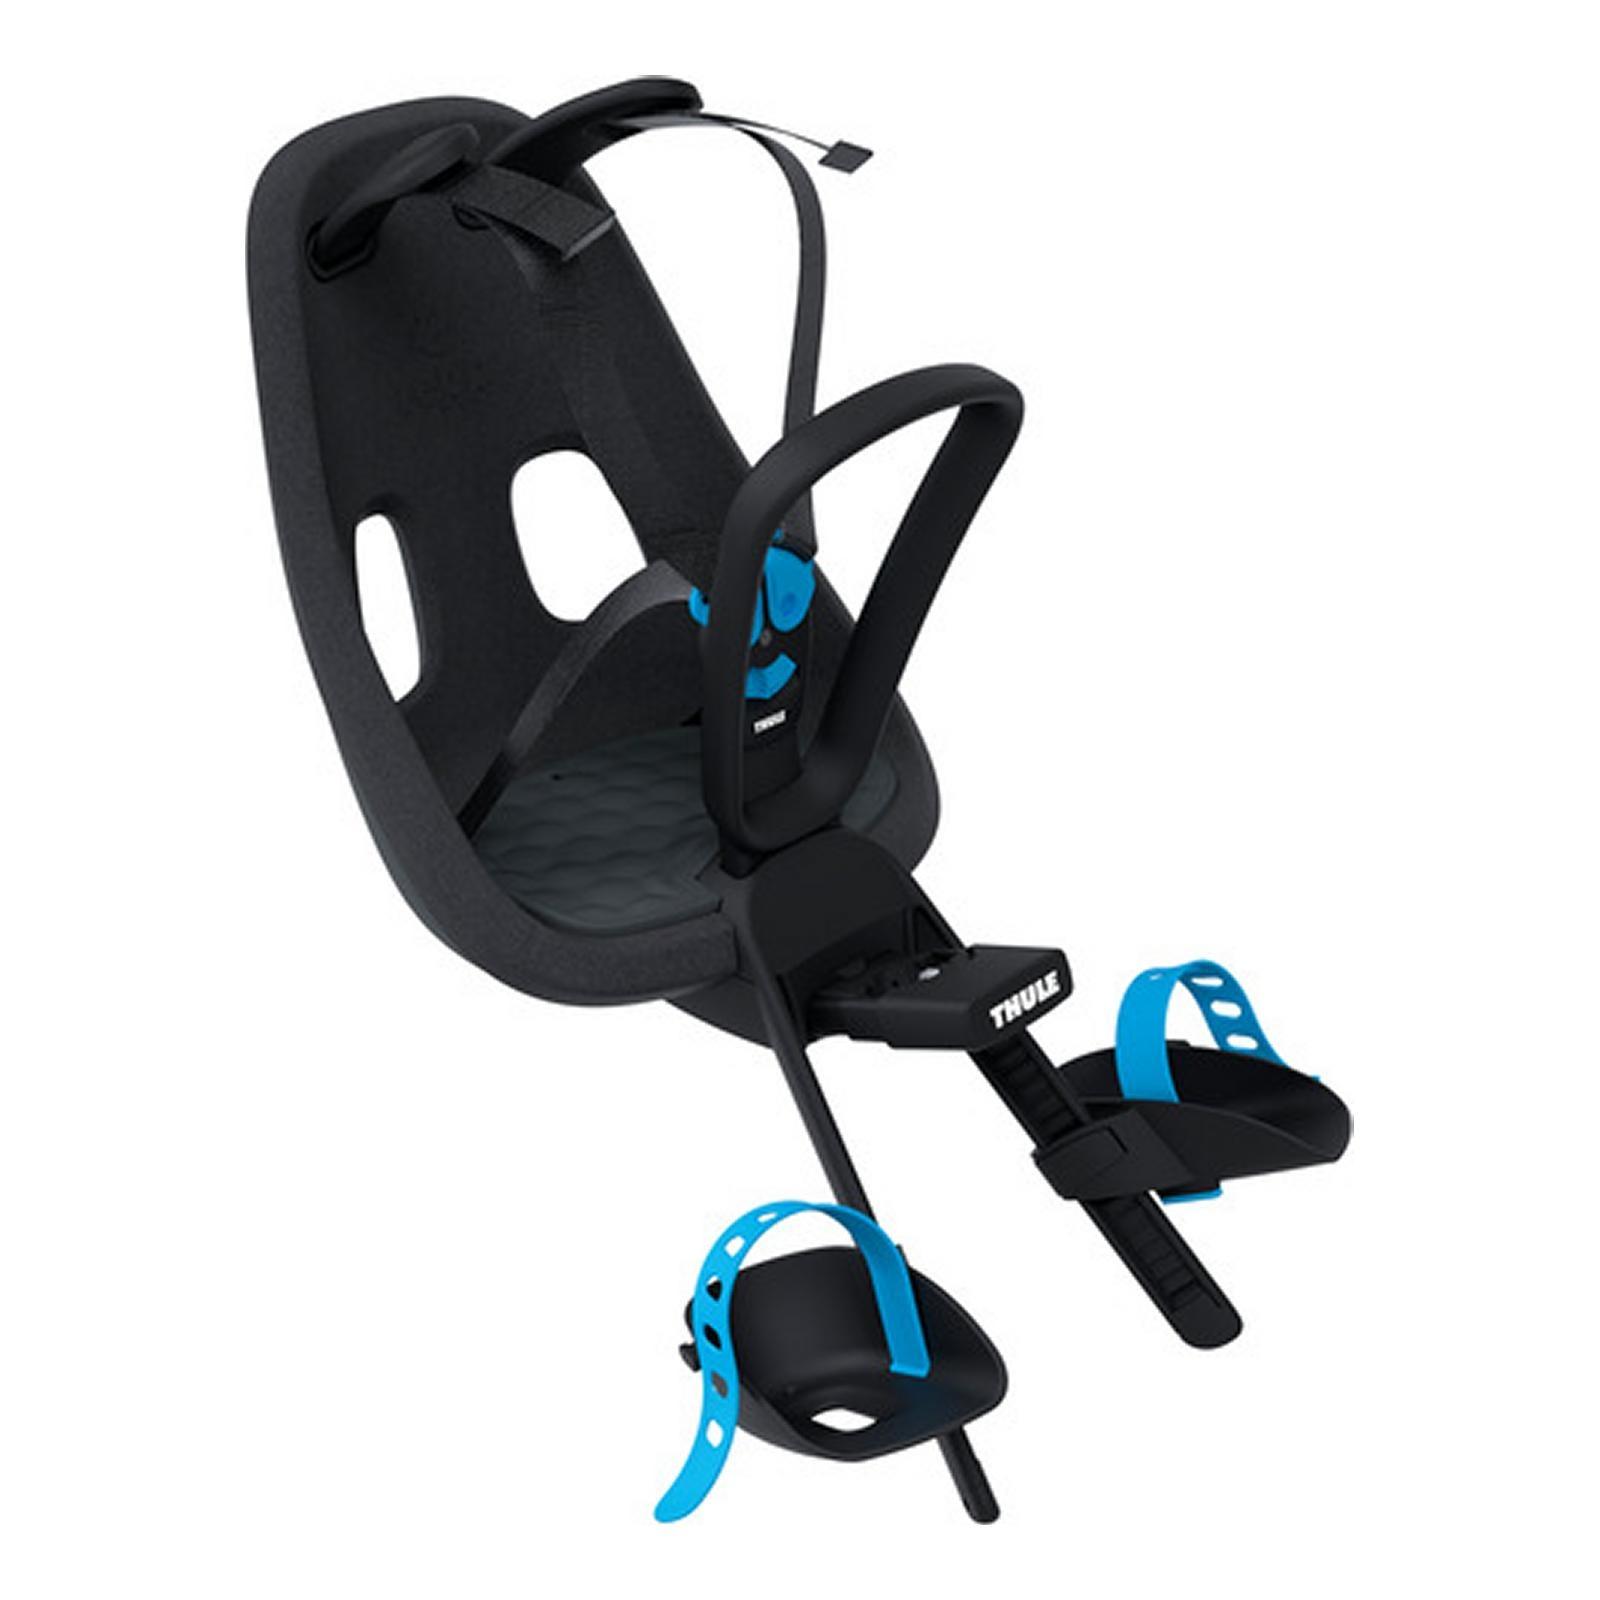 Nexxt Mini Voorstoeltje Obsidian Zwart/Blauw